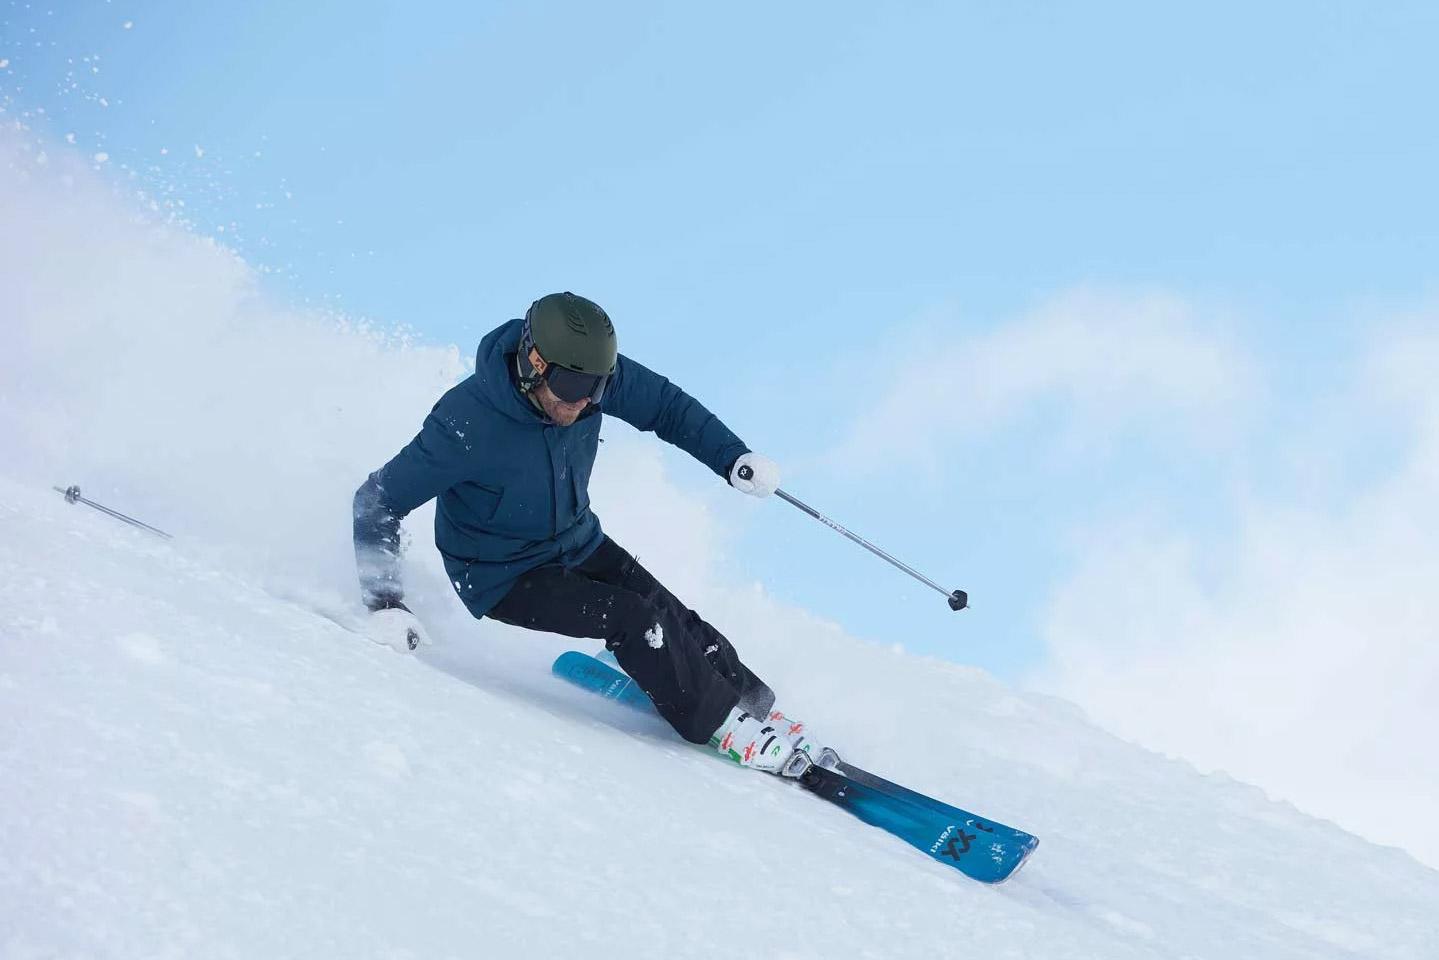 man skiing with volkl kendo 88 all-mountain skis